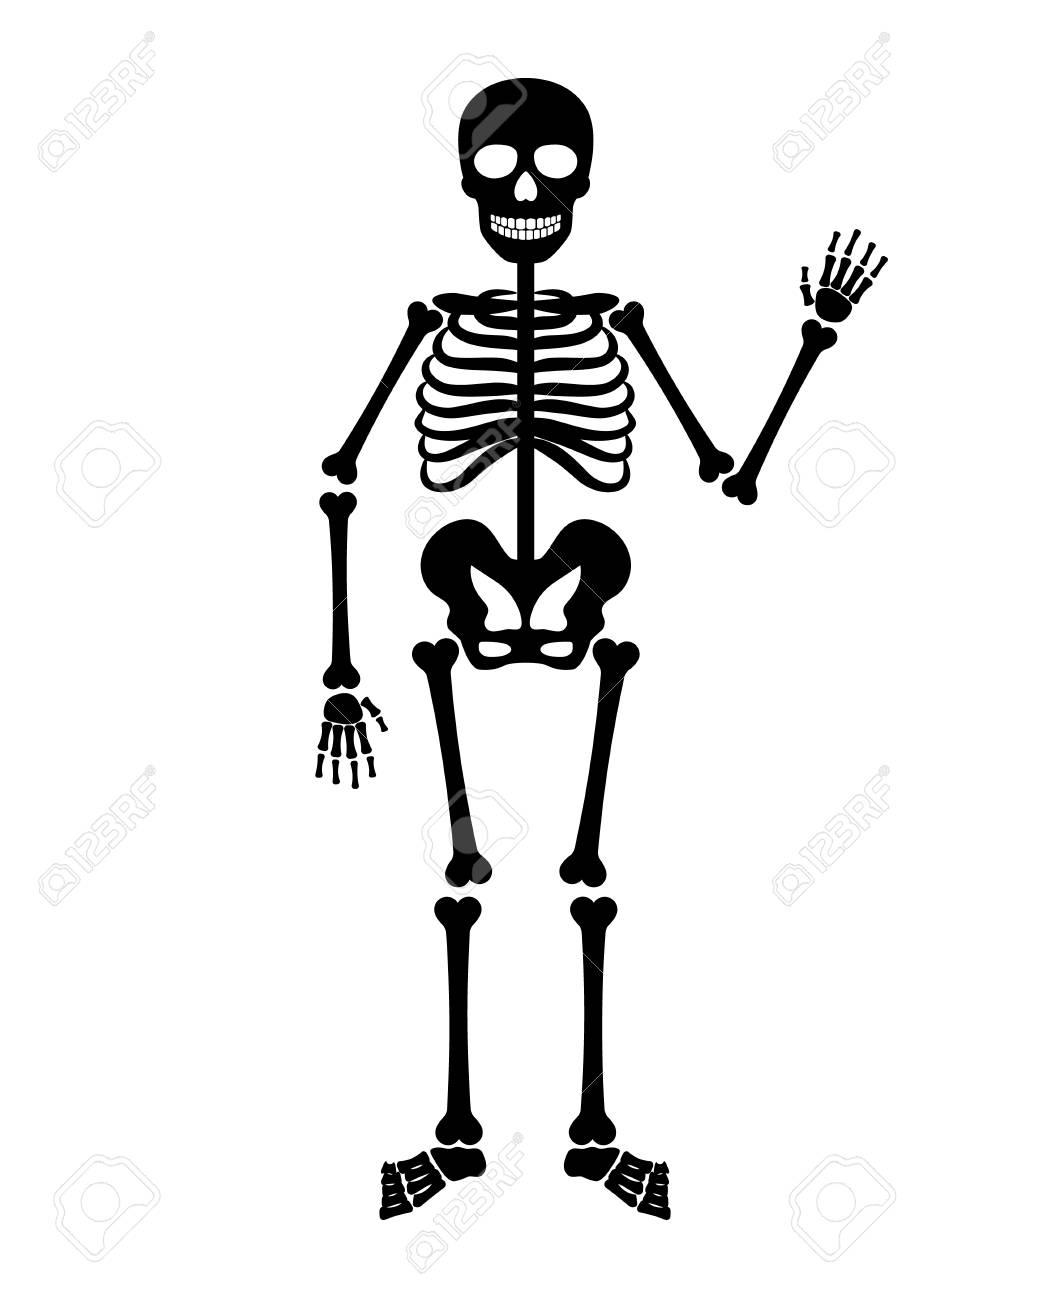 skeleton human anatomy vector halloween black skeleton isolated rh 123rf com skeleton vector illustration free skeleton vector free download